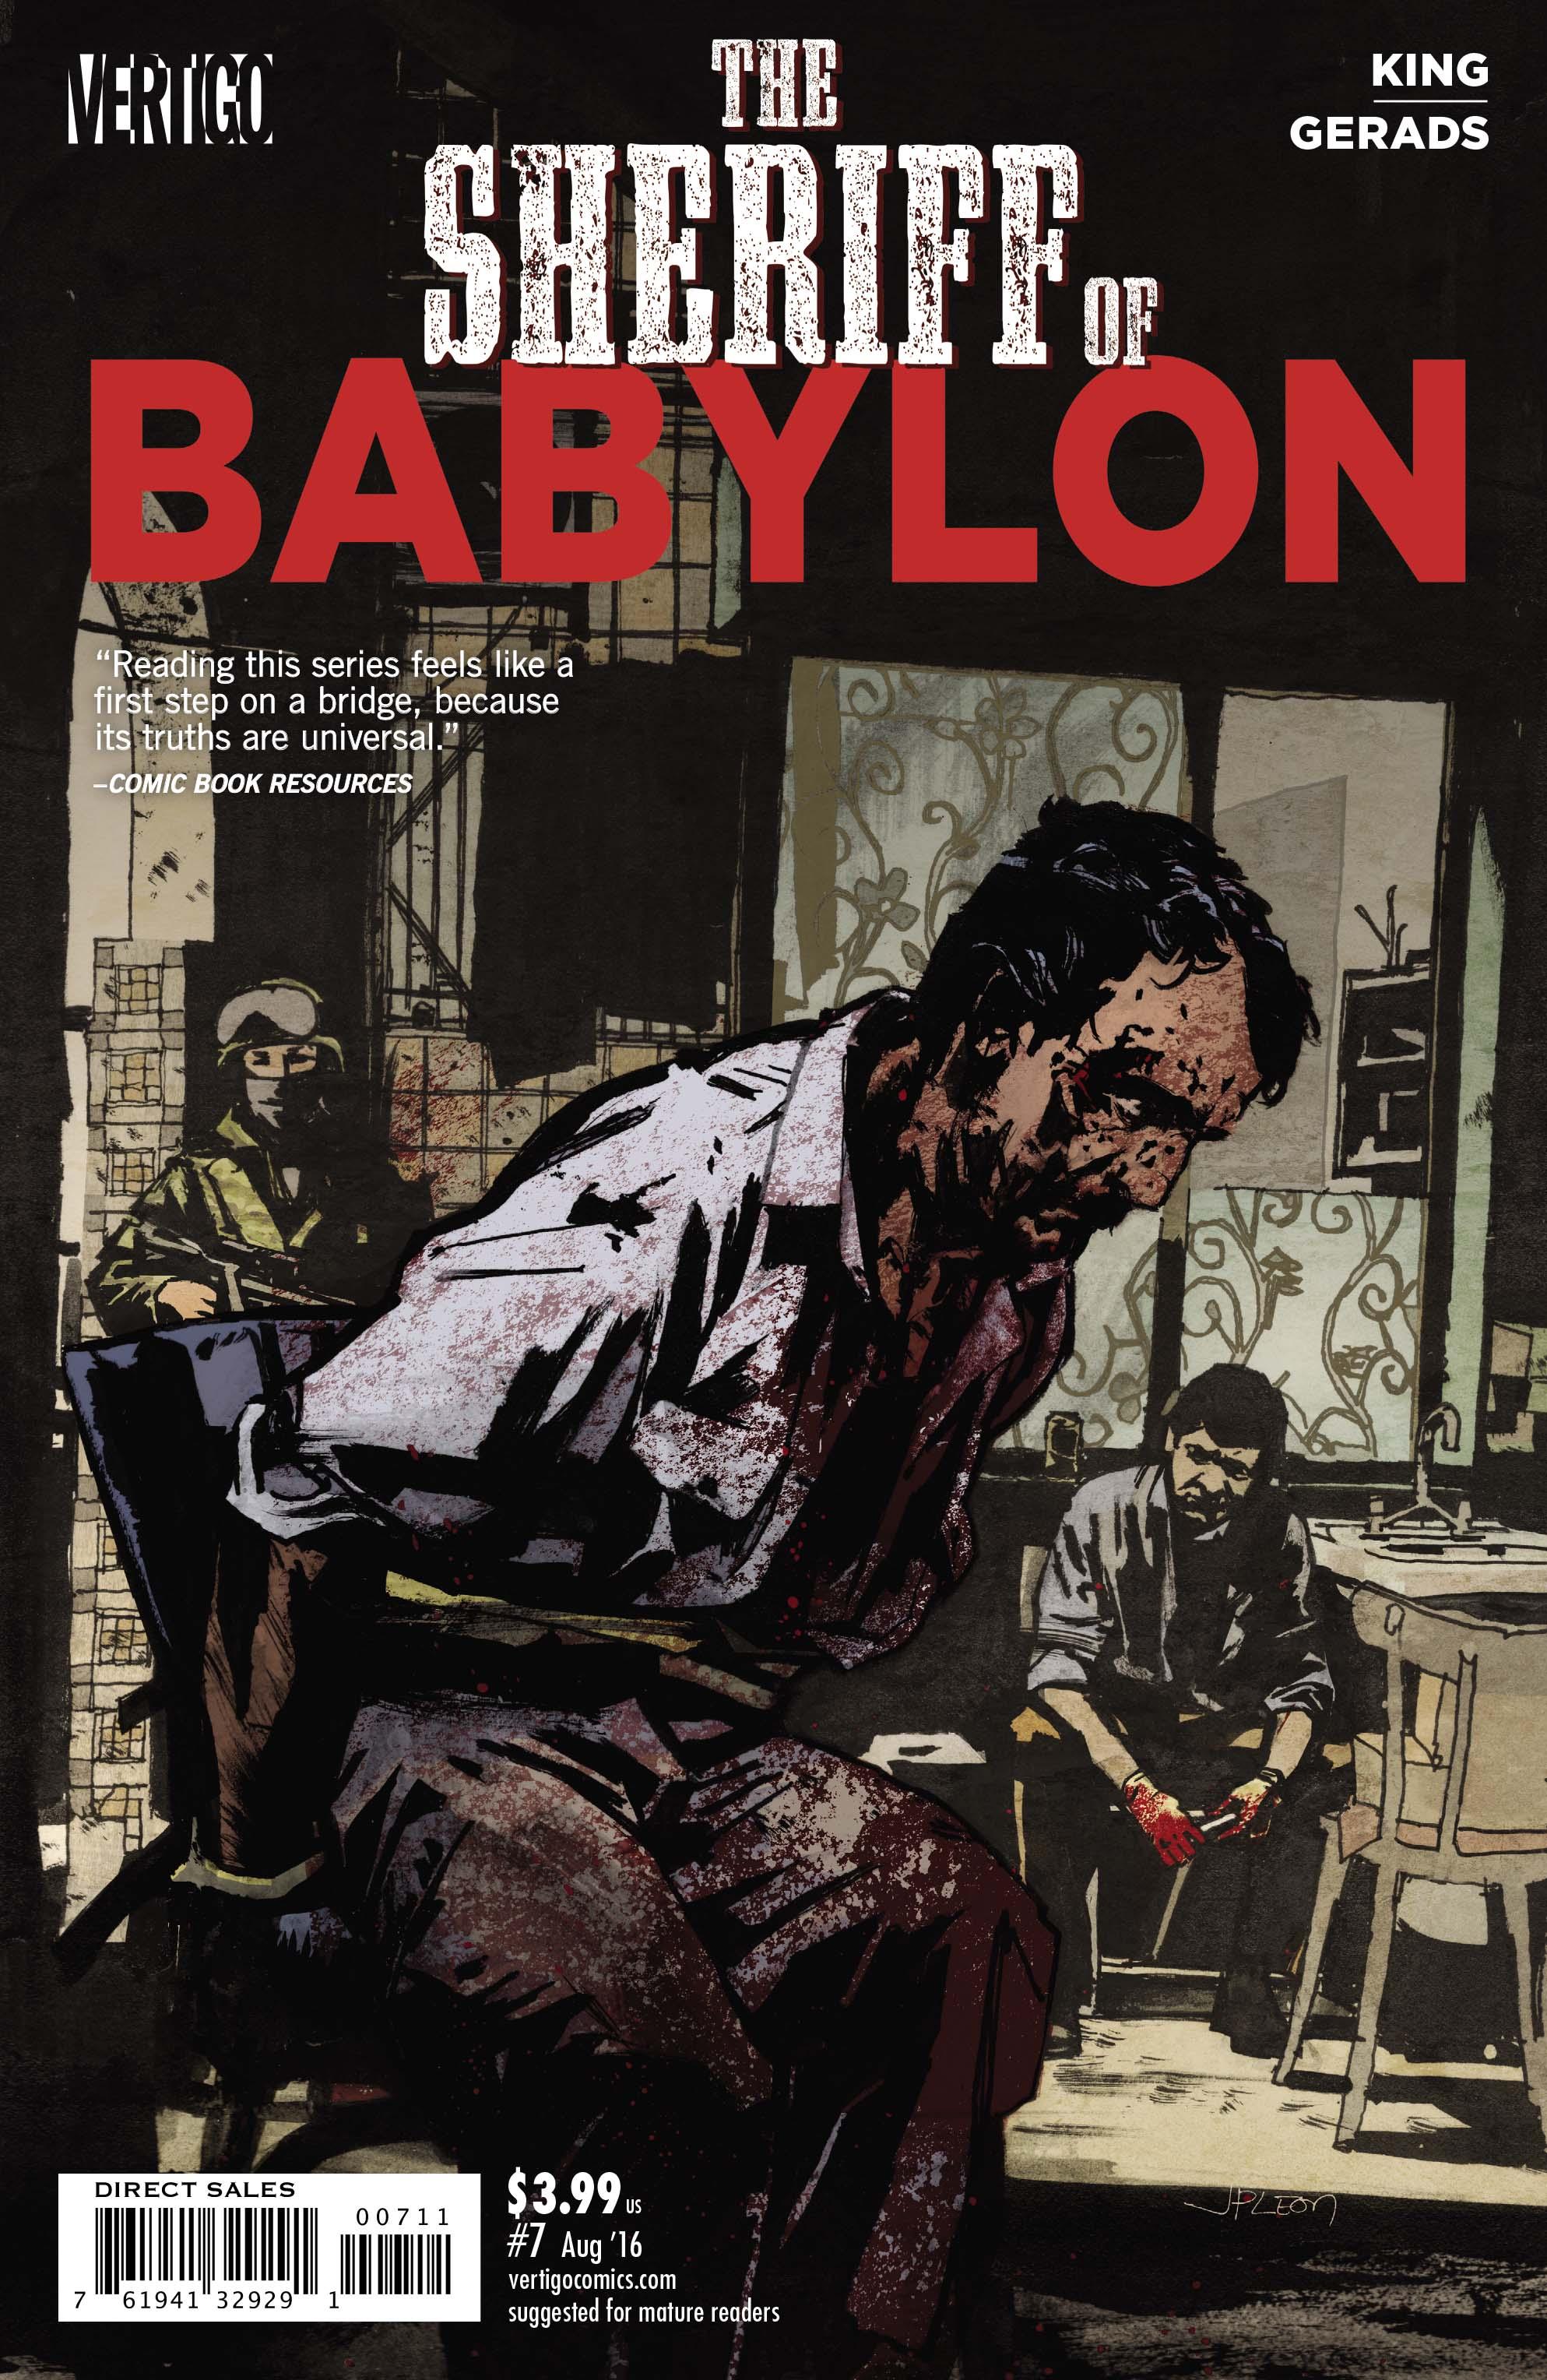 THE SHERIFF OF BABYLON #7 cover